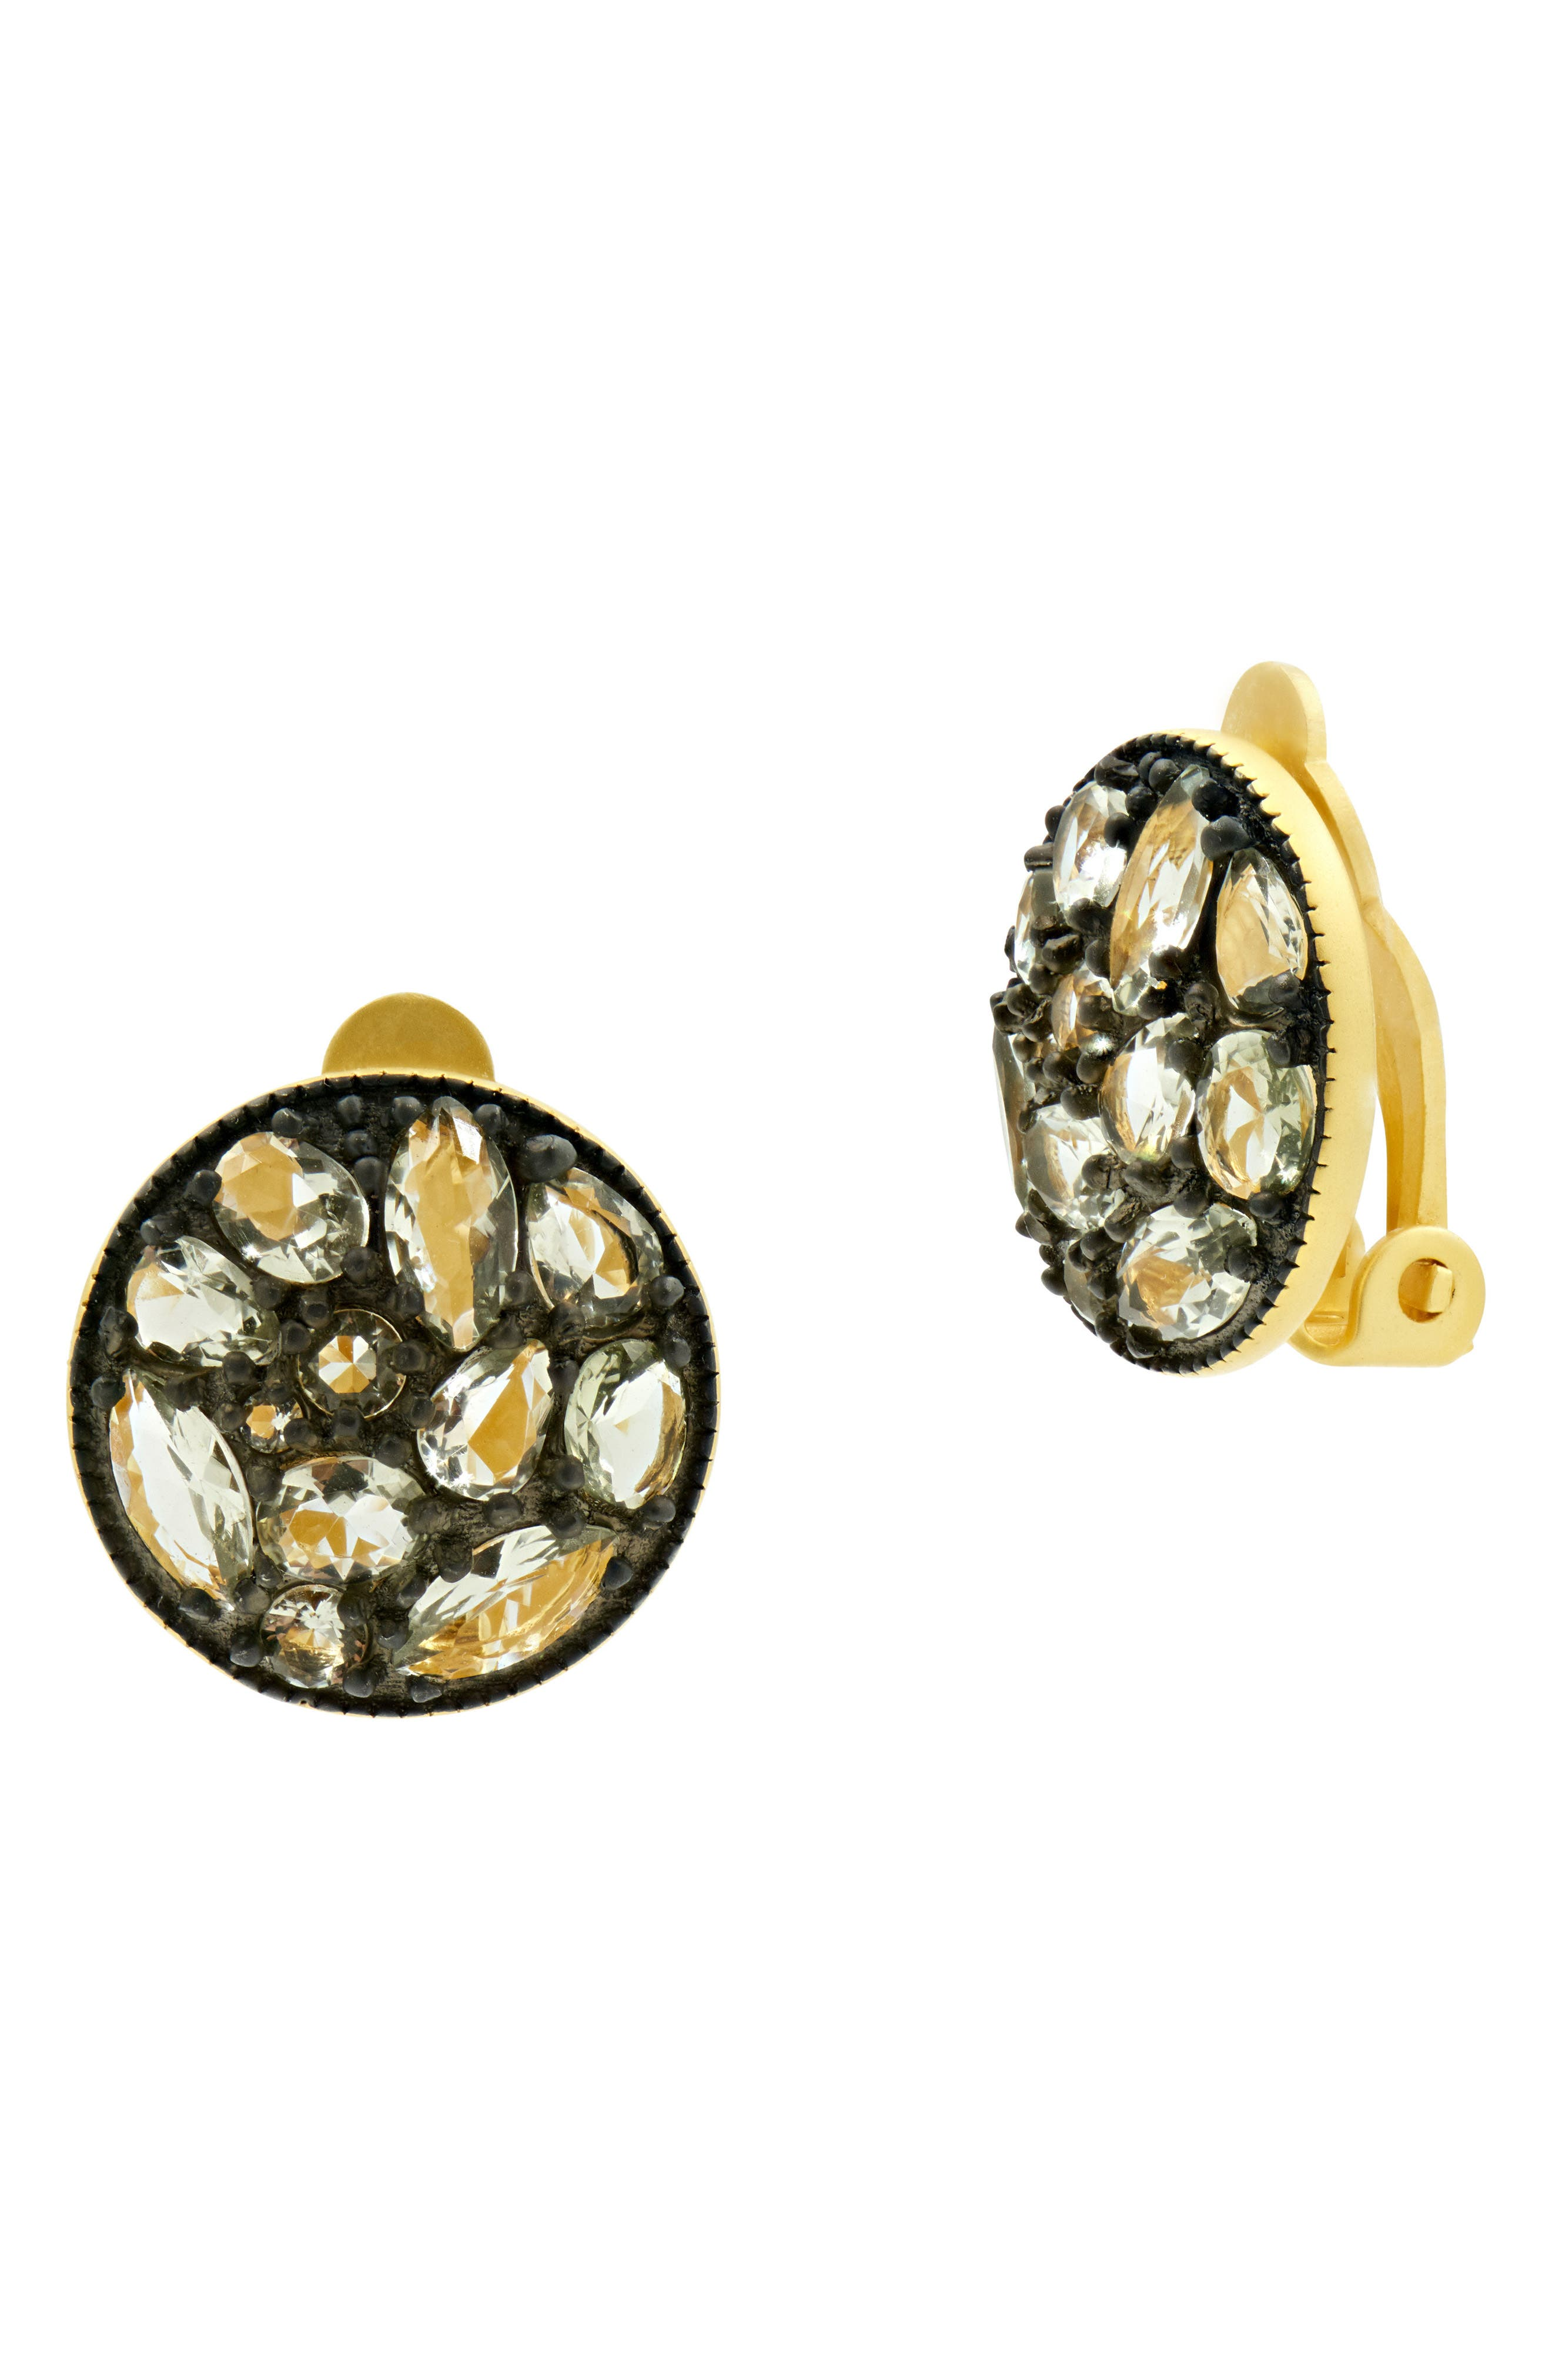 Rose Dor Disc Clip Earrings,                             Main thumbnail 1, color,                             Black Rhodium/ Gold